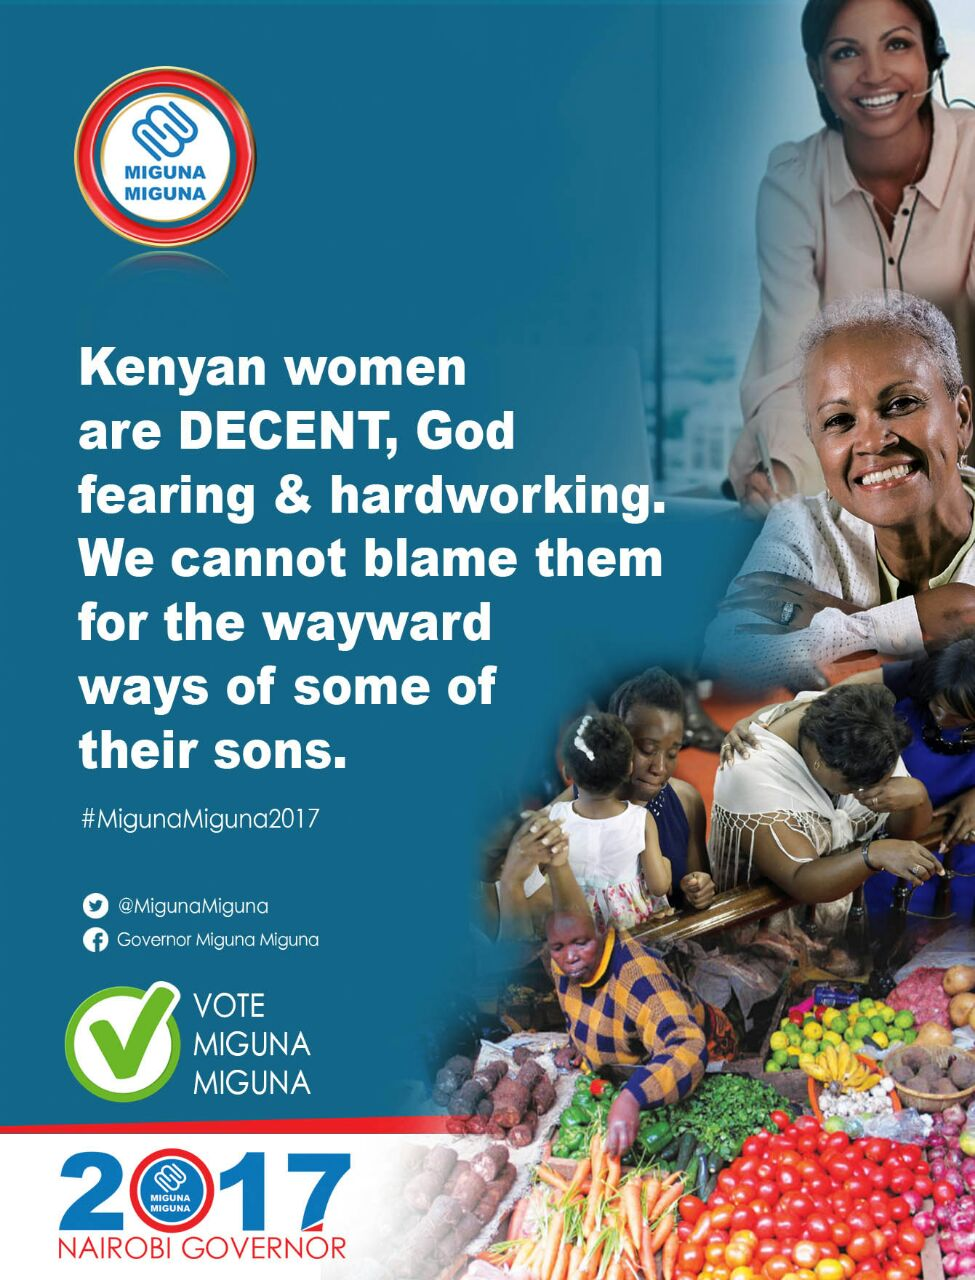 Kenyan women are decent, we cannot blame them.